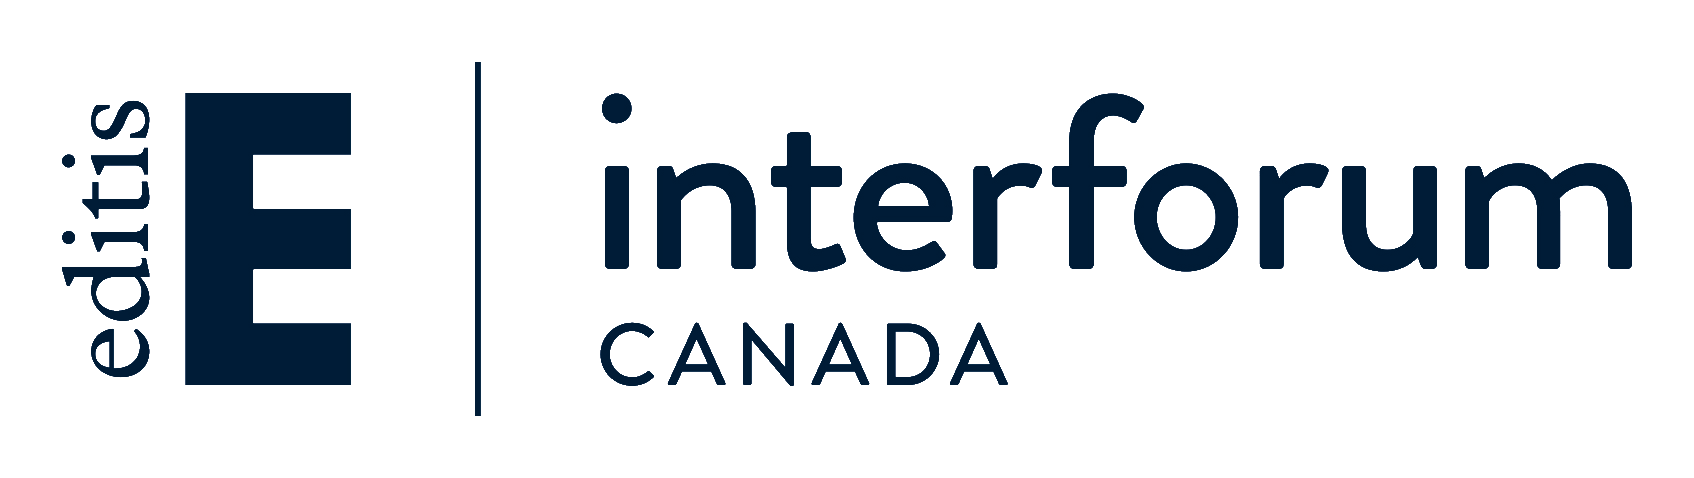 edi_Inter_pays_logo_Q_bleu_canada